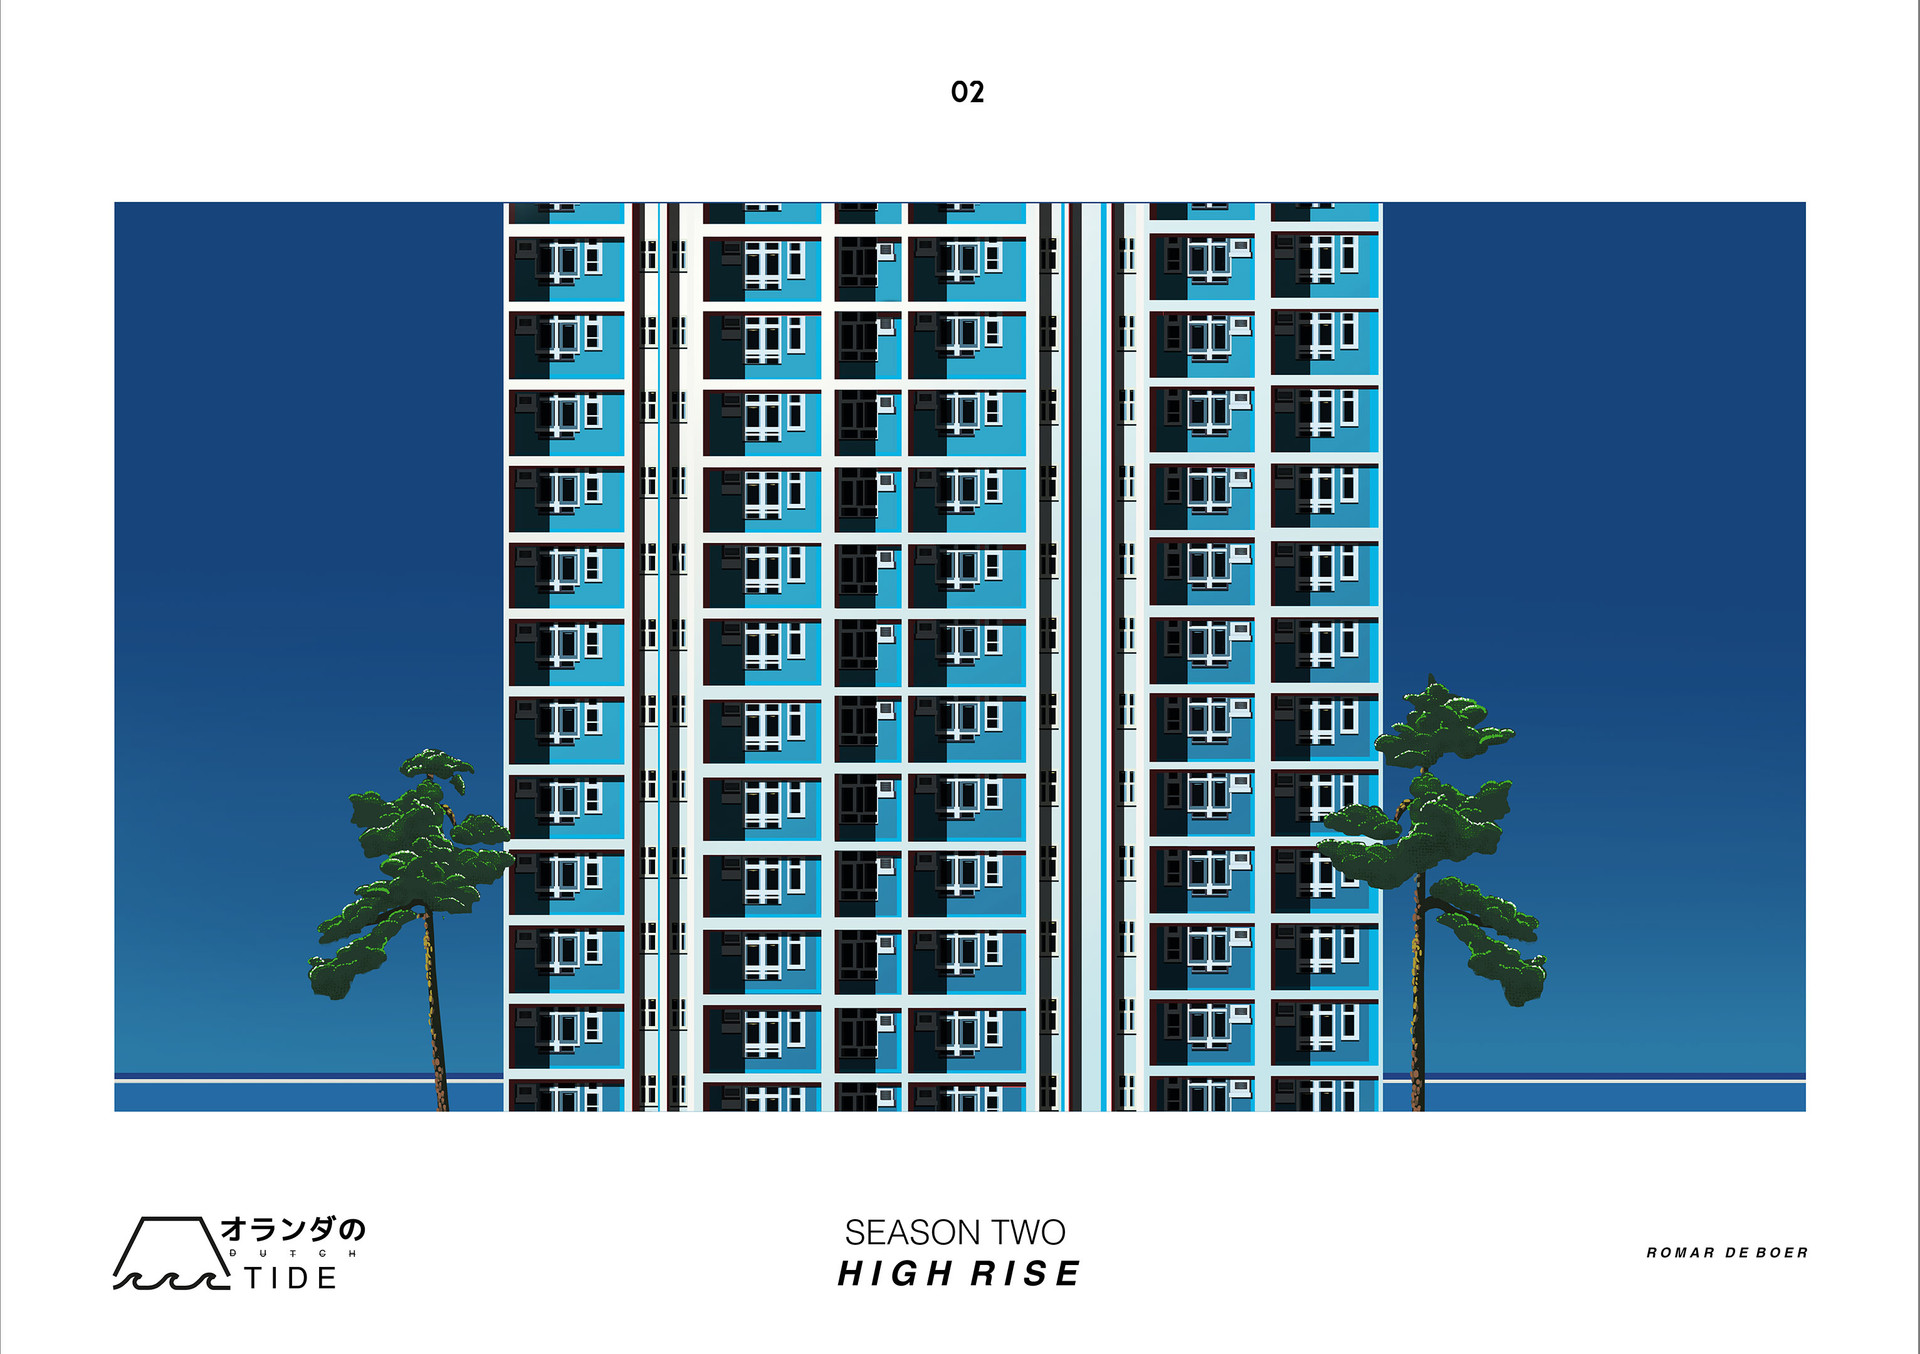 highrise_02_a2_web.jpg